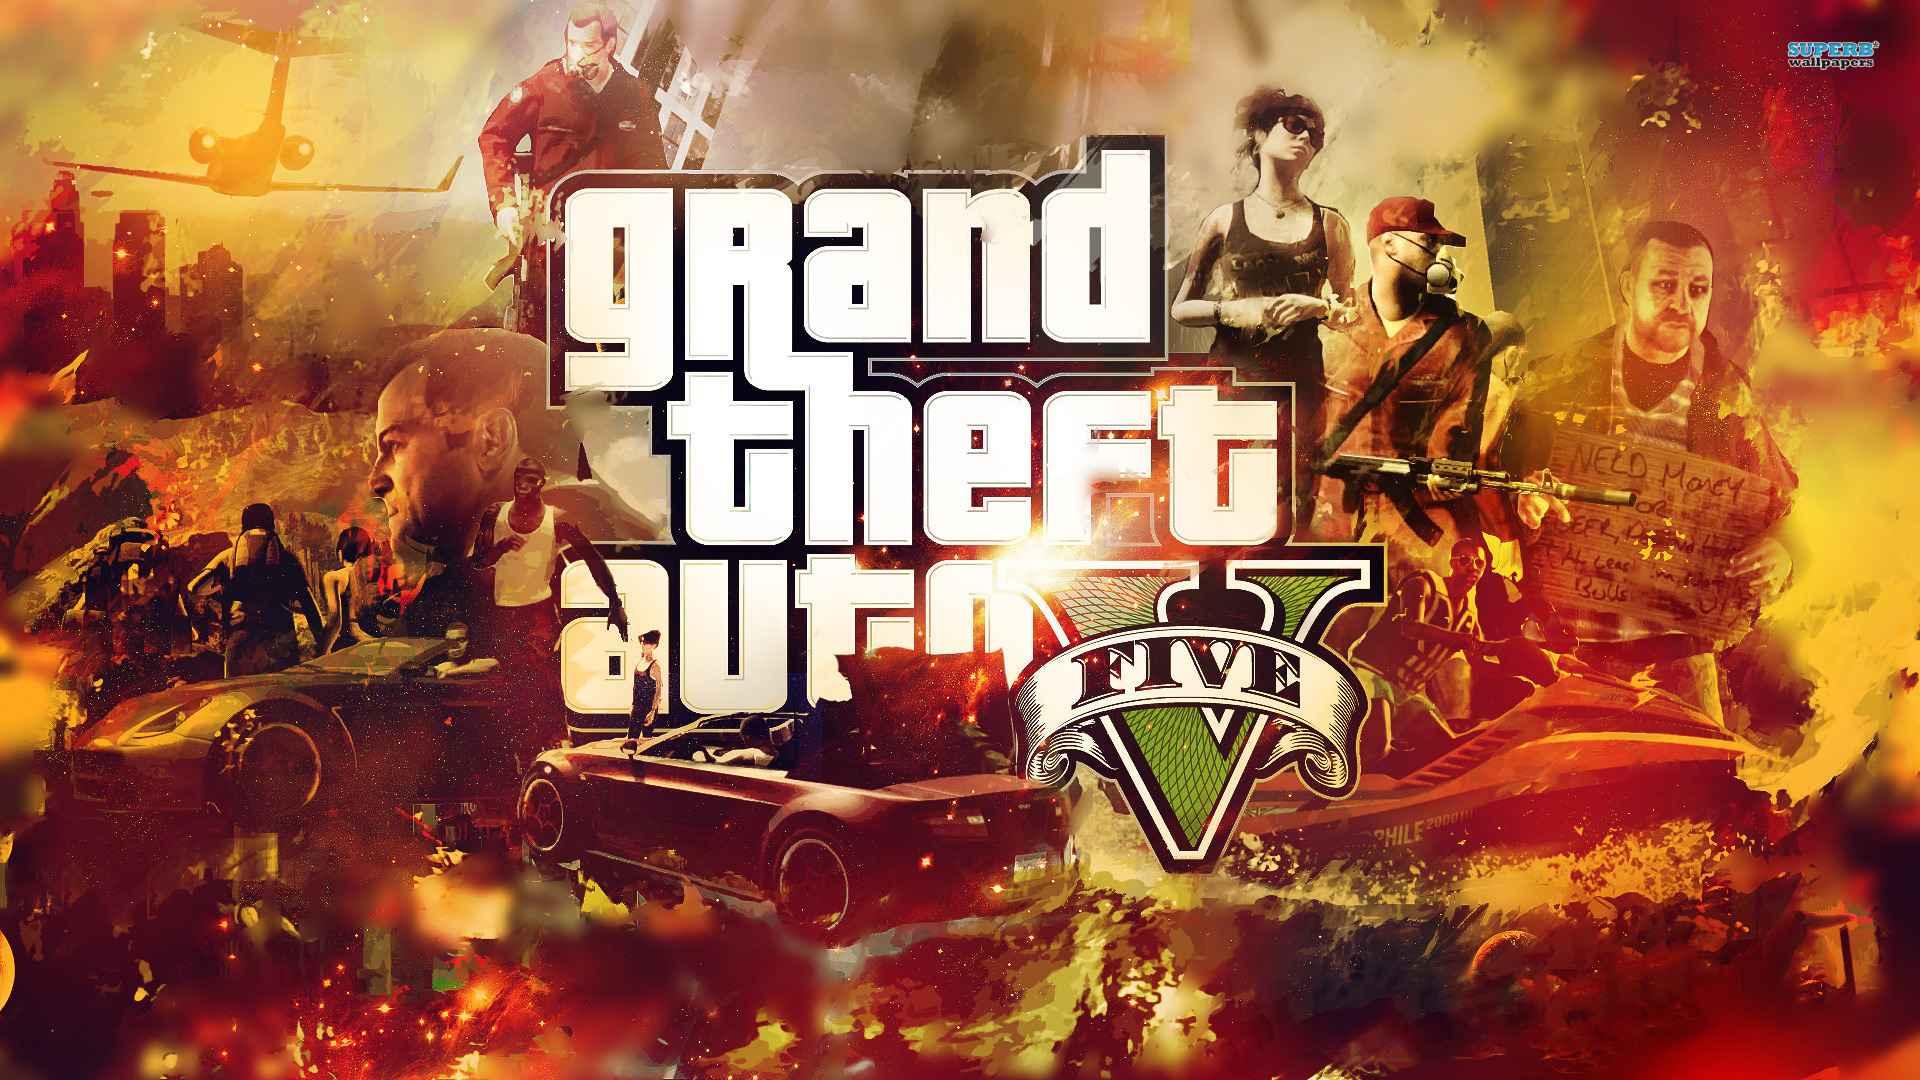 Game Grand Theft Auto V Wallpaper 057